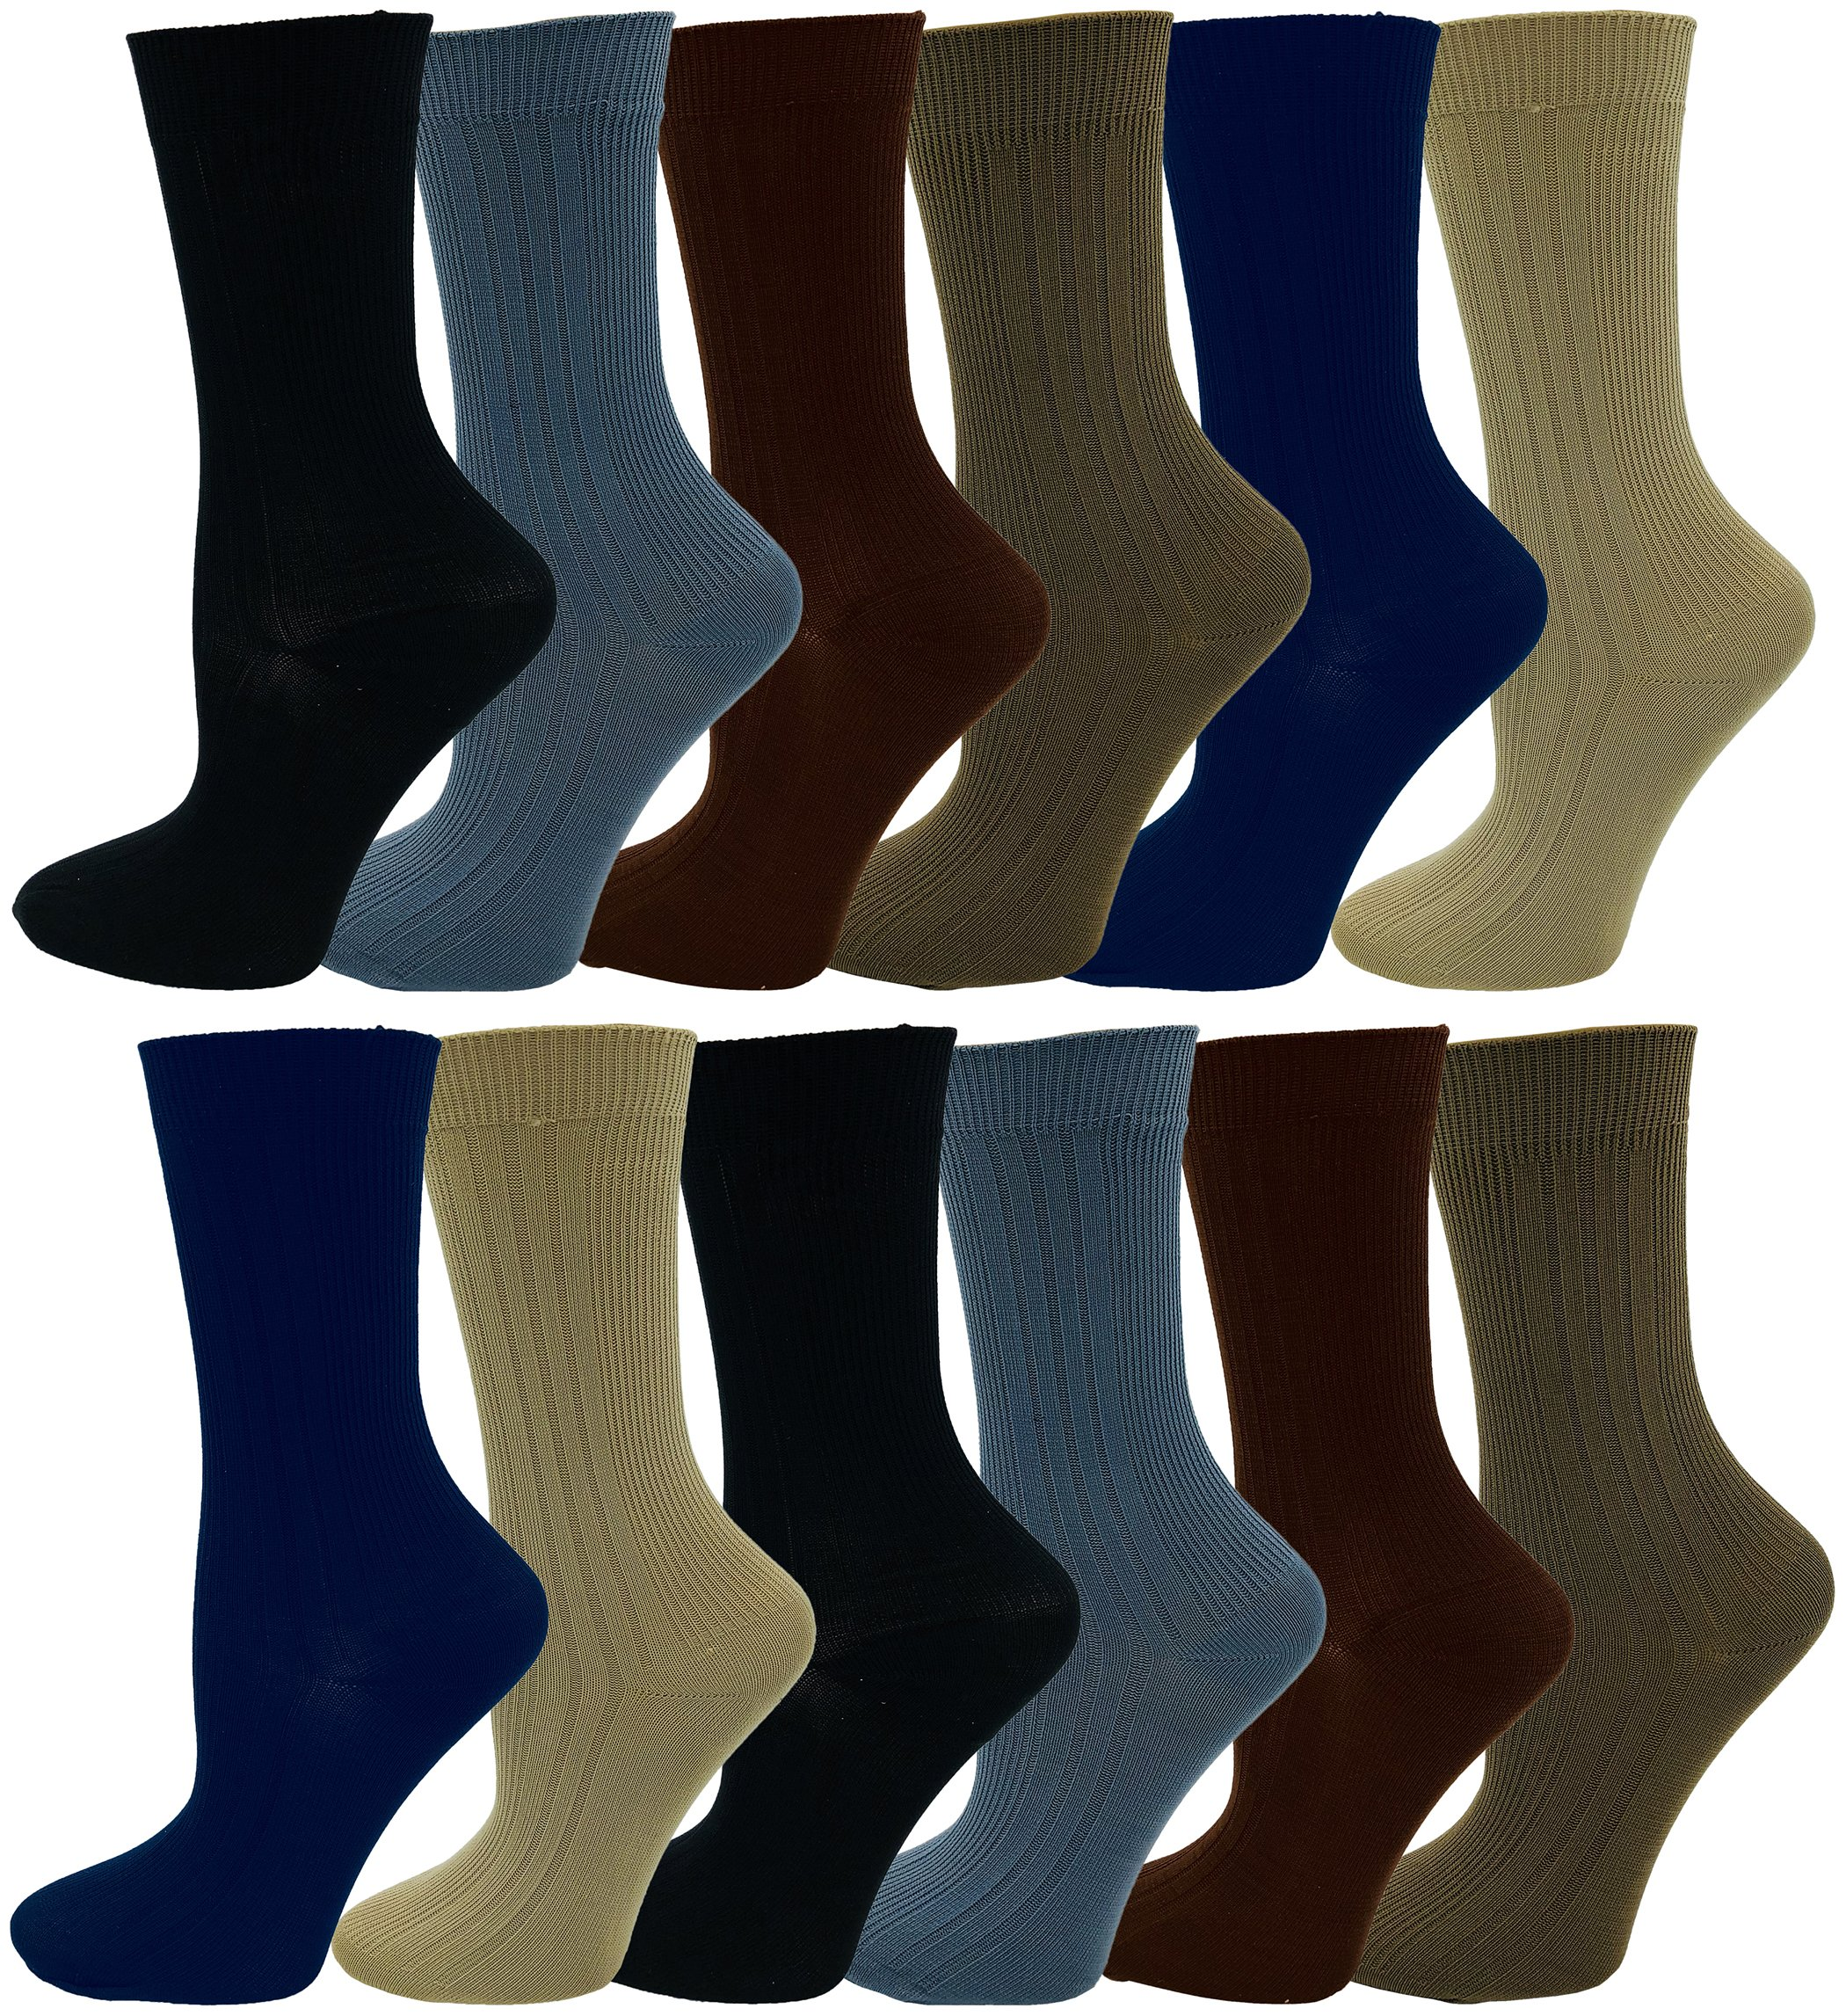 c79322bfc1b6 Get Quotations · Boys Dress Socks, 12 Pairs, Comfort Soft Stretchy Kids  Crew Sock, Ribbed Stylish